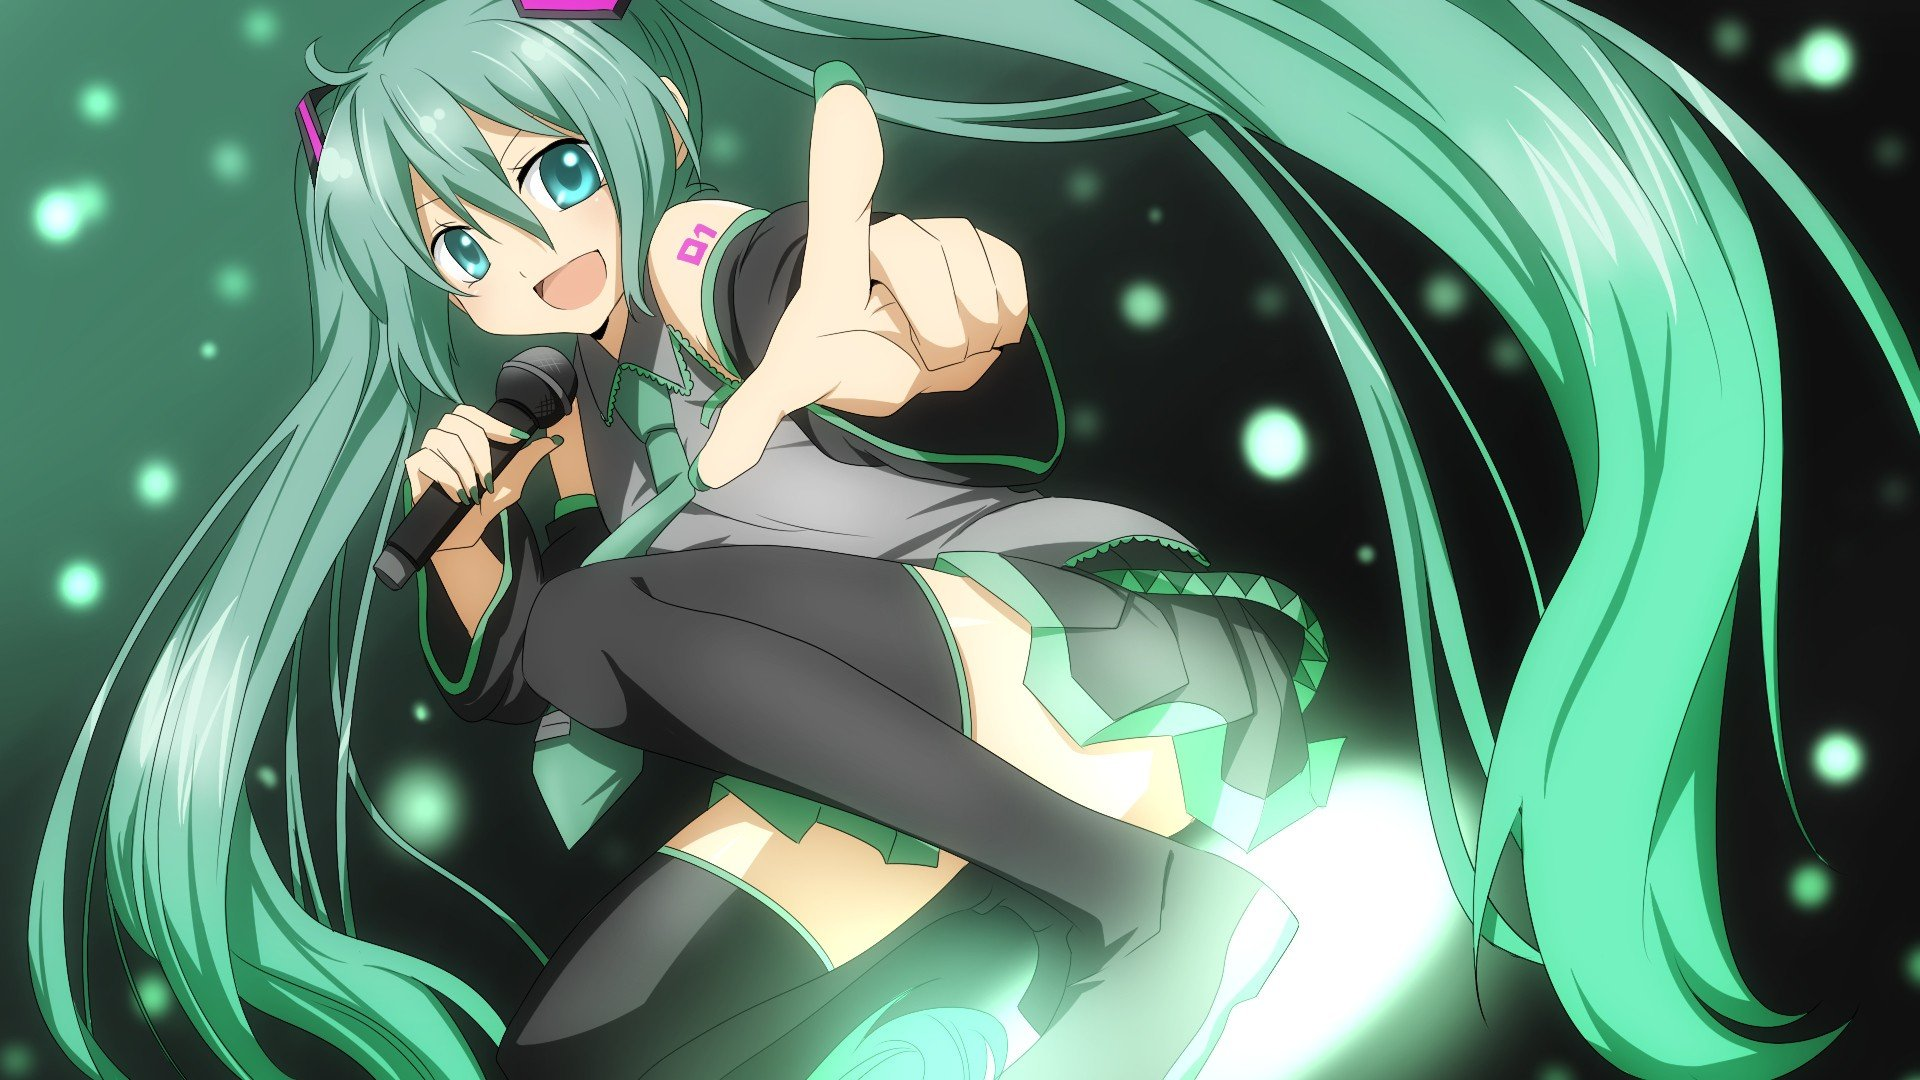 Kitsune Girl Hd Wallpaper Tattoos Vocaloid Hatsune Miku Green Eyes Green Hair Anime